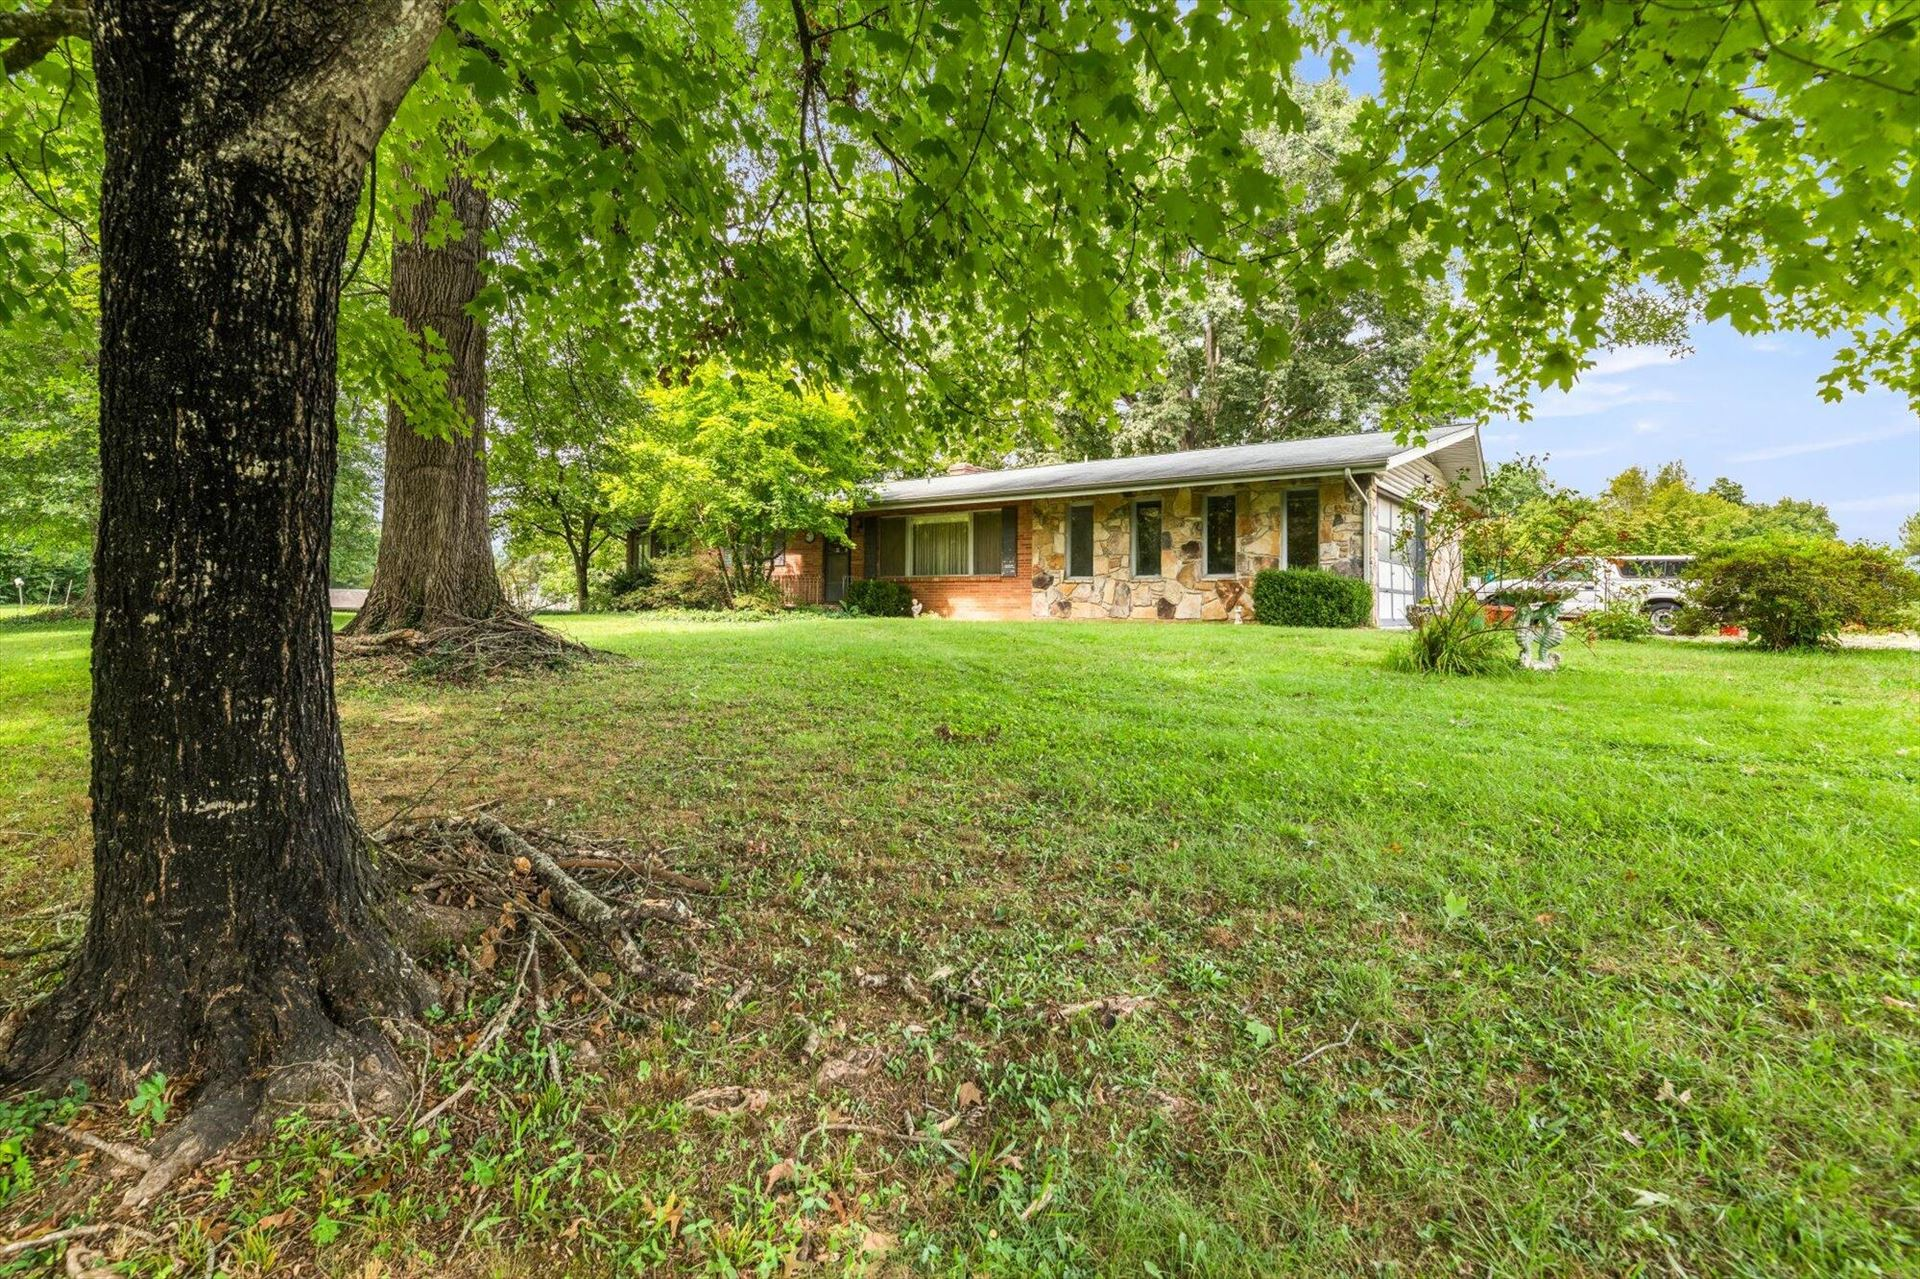 Photo of 10709 Fox Park Lane, Knoxville, TN 37931 (MLS # 1167780)